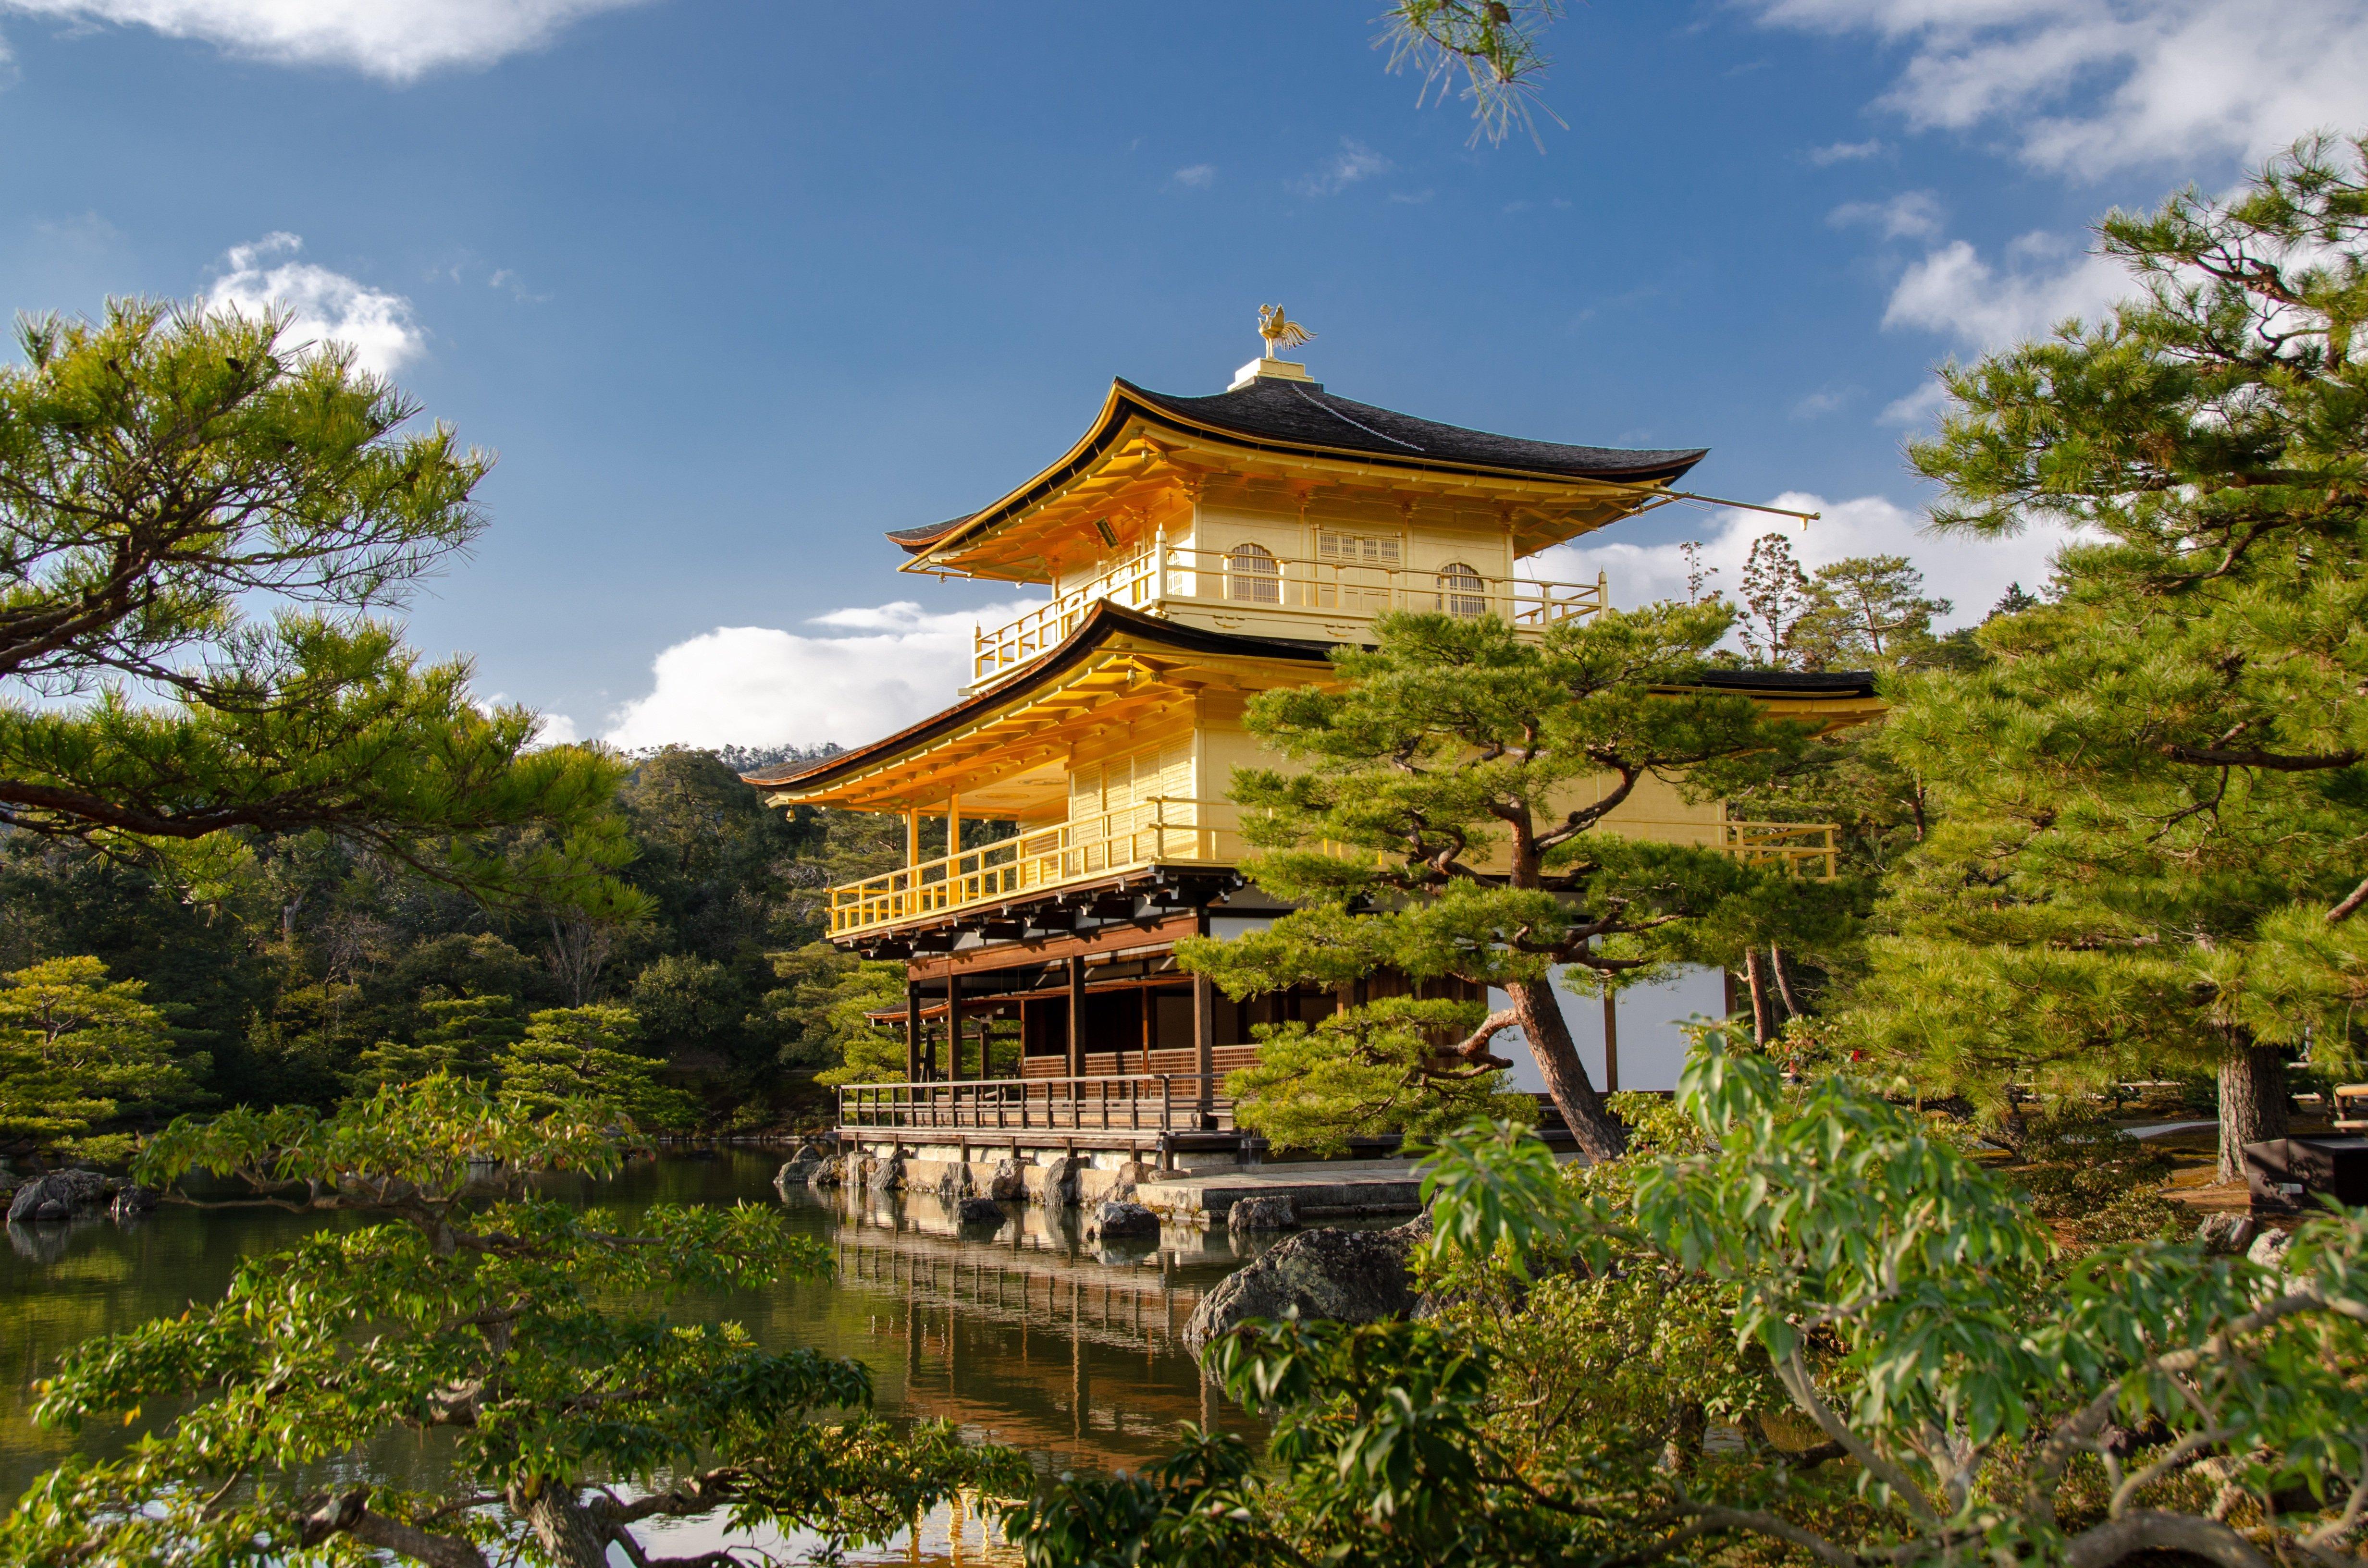 Wallpaper Kyoto Japan Kinkaku-JI Gardens temple Cities 4928x3264 Temples